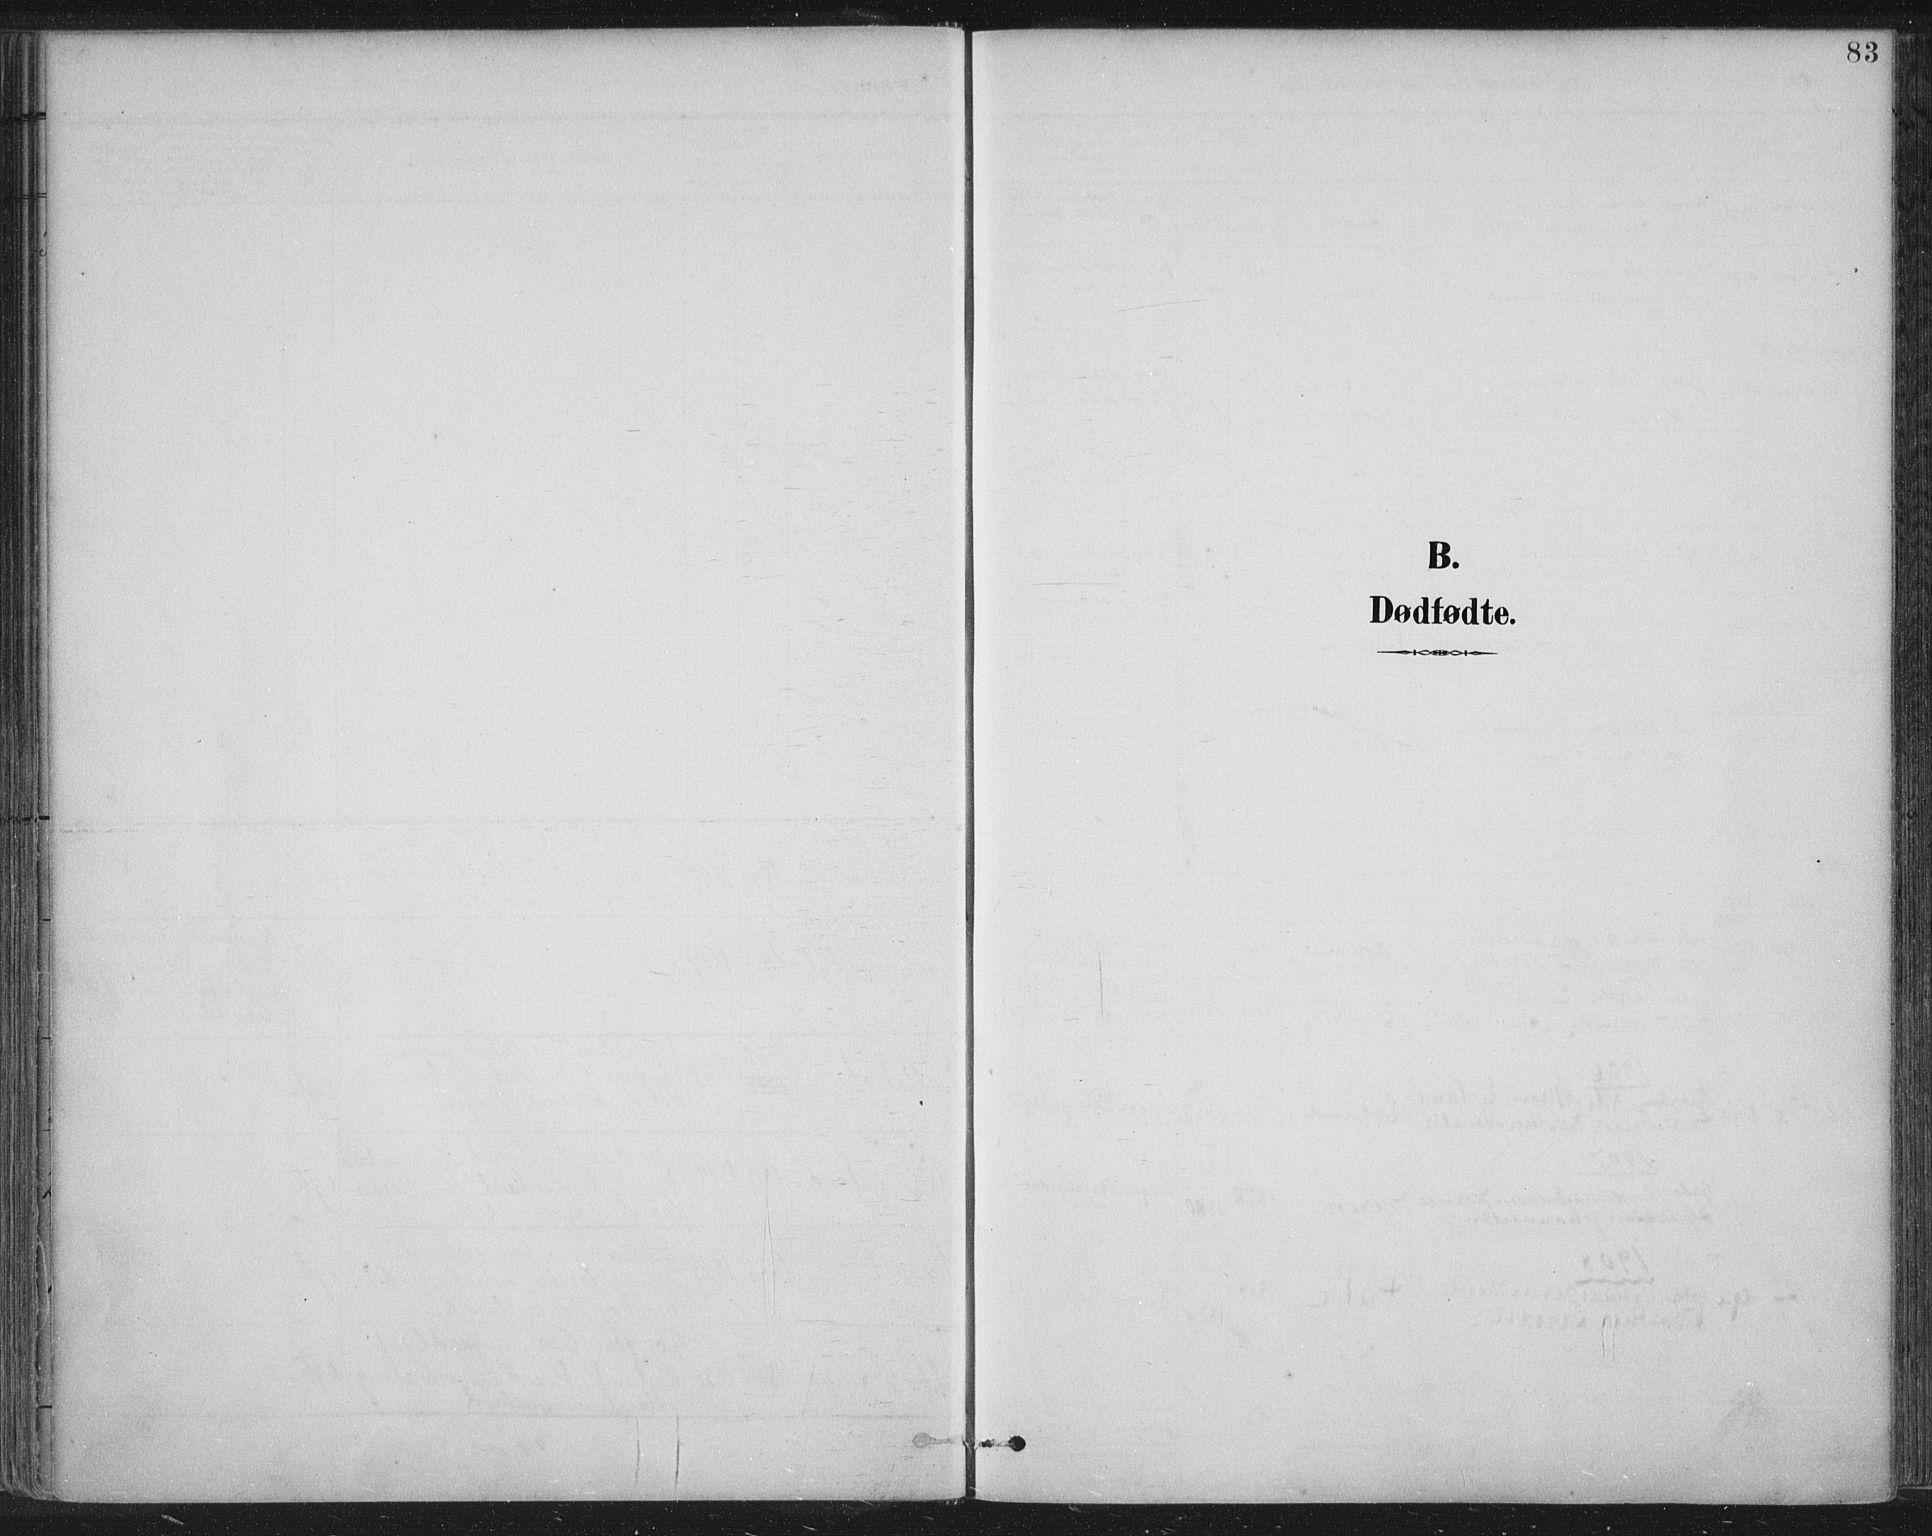 SAST, Tysvær sokneprestkontor, H/Ha/Haa/L0008: Ministerialbok nr. A 8, 1897-1918, s. 83